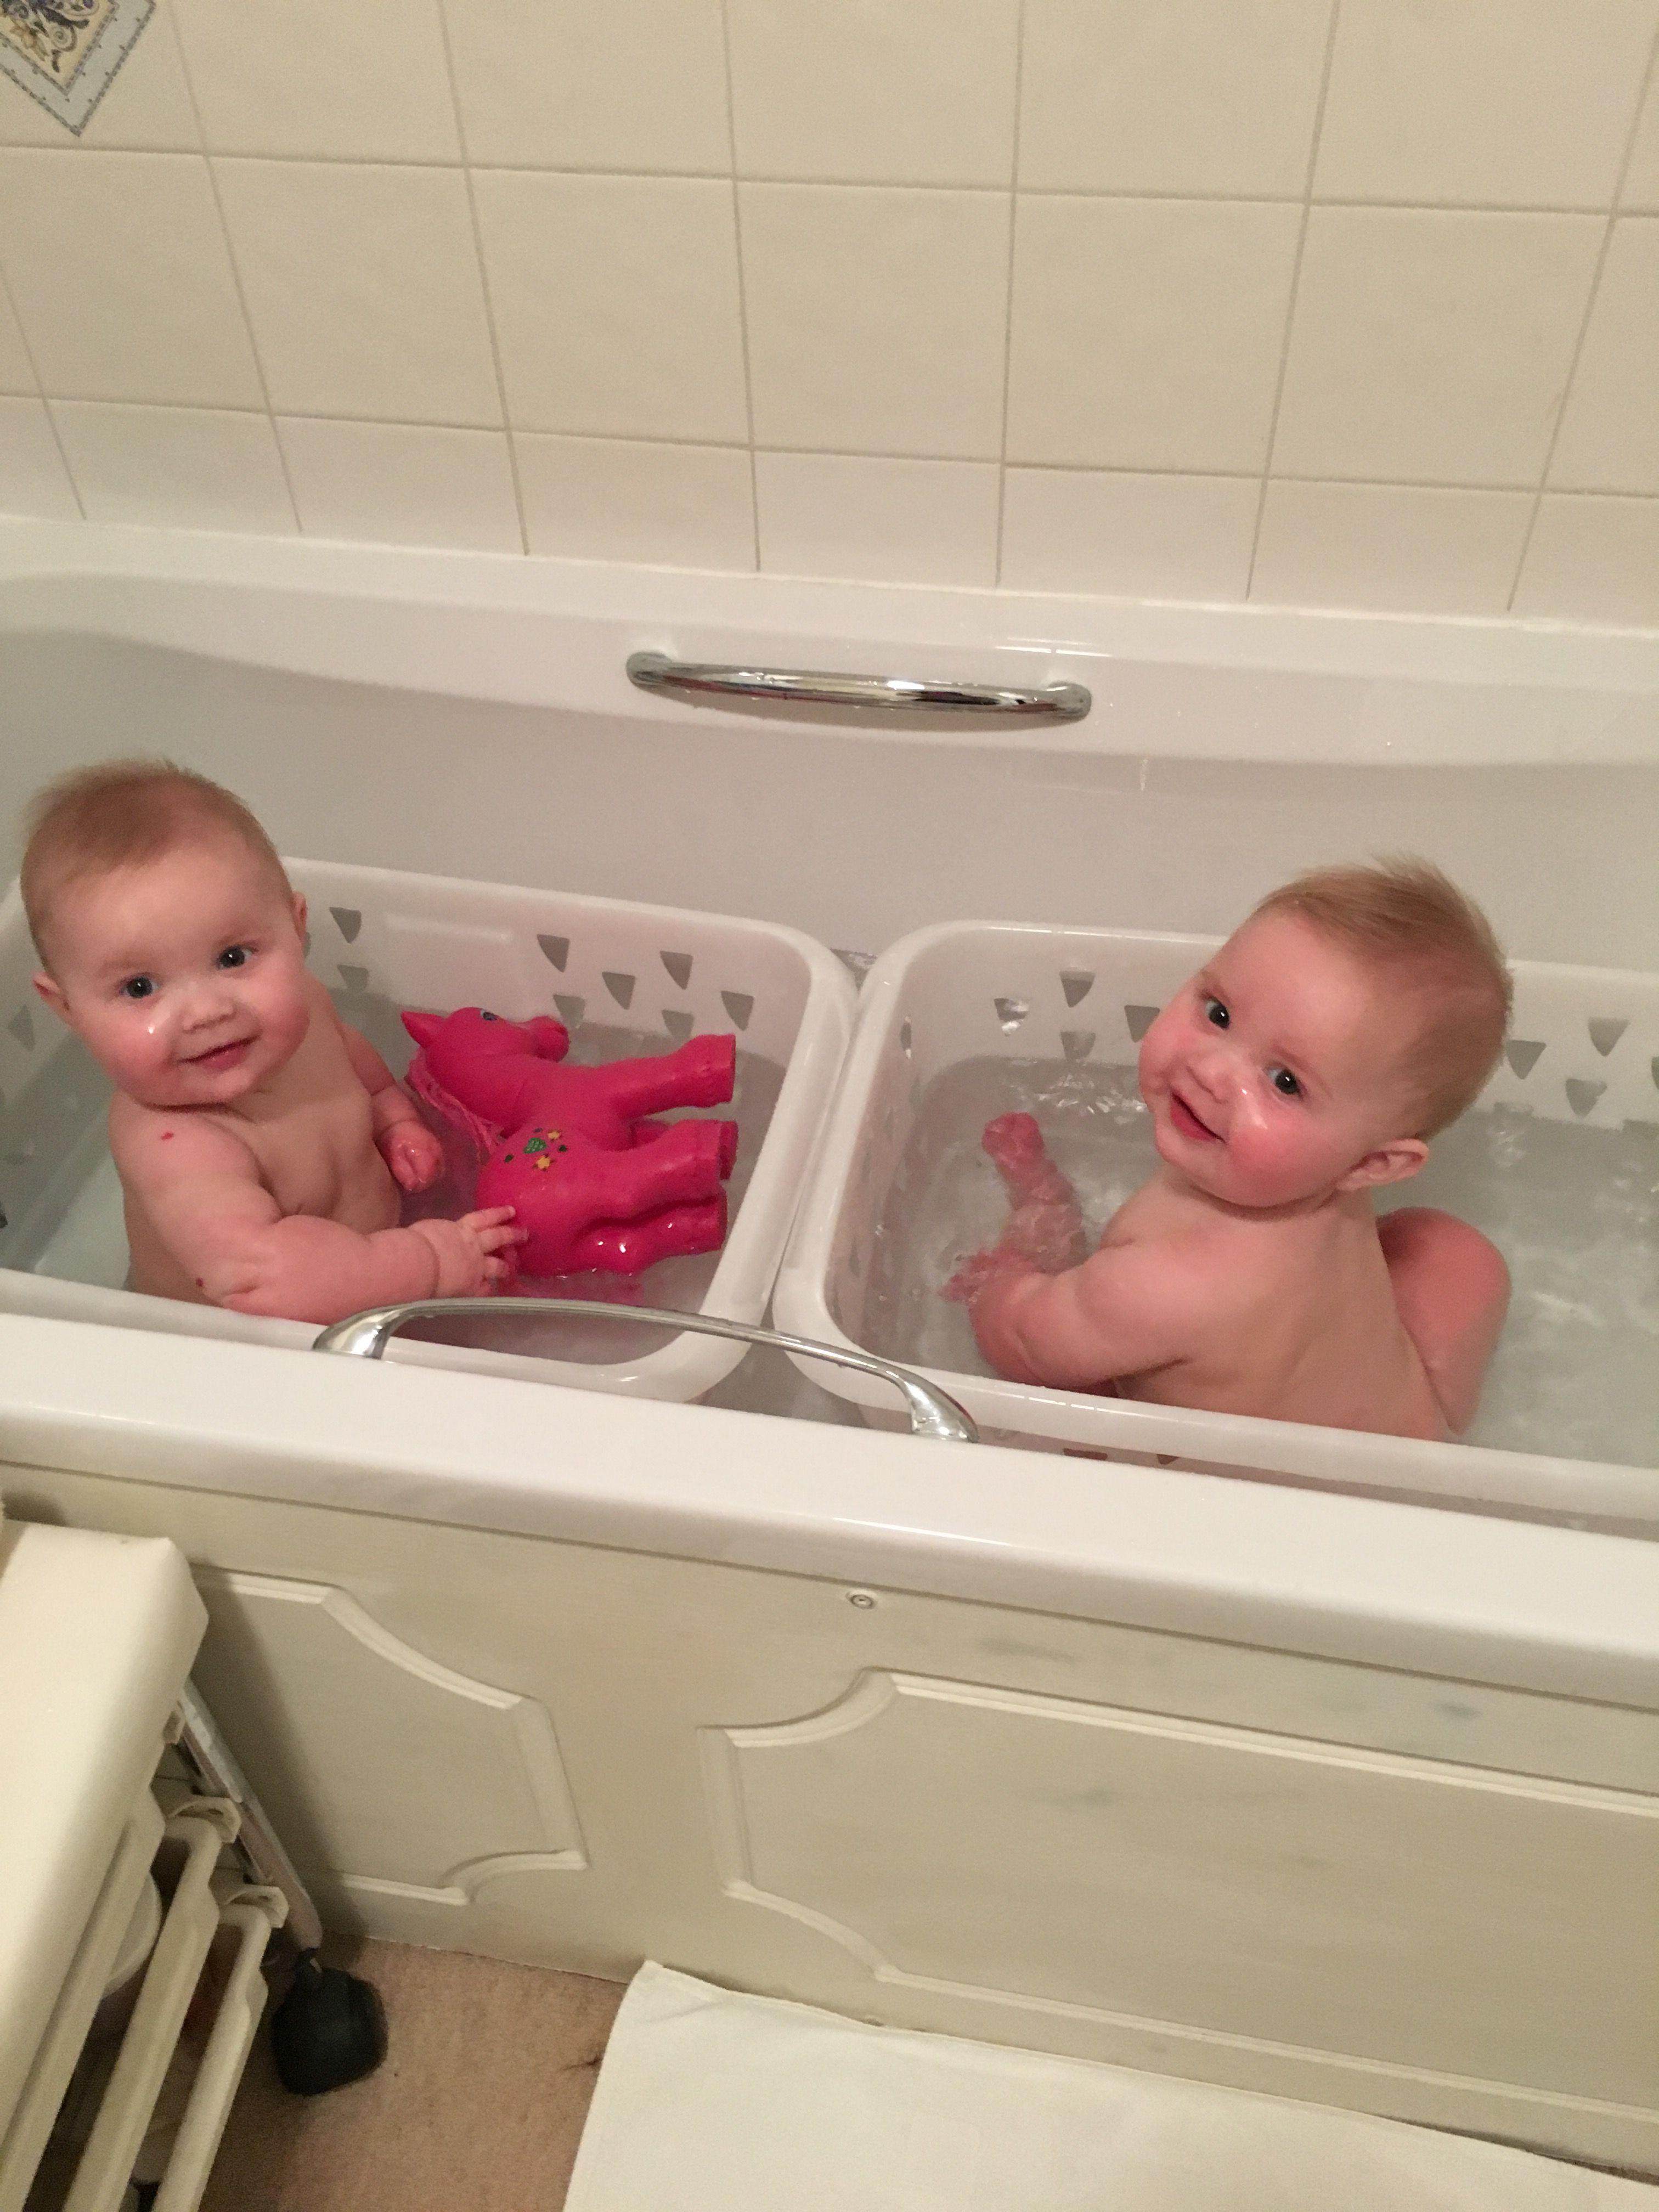 Makeshift Baby Bath Seats Babies Baby Bath Seat New